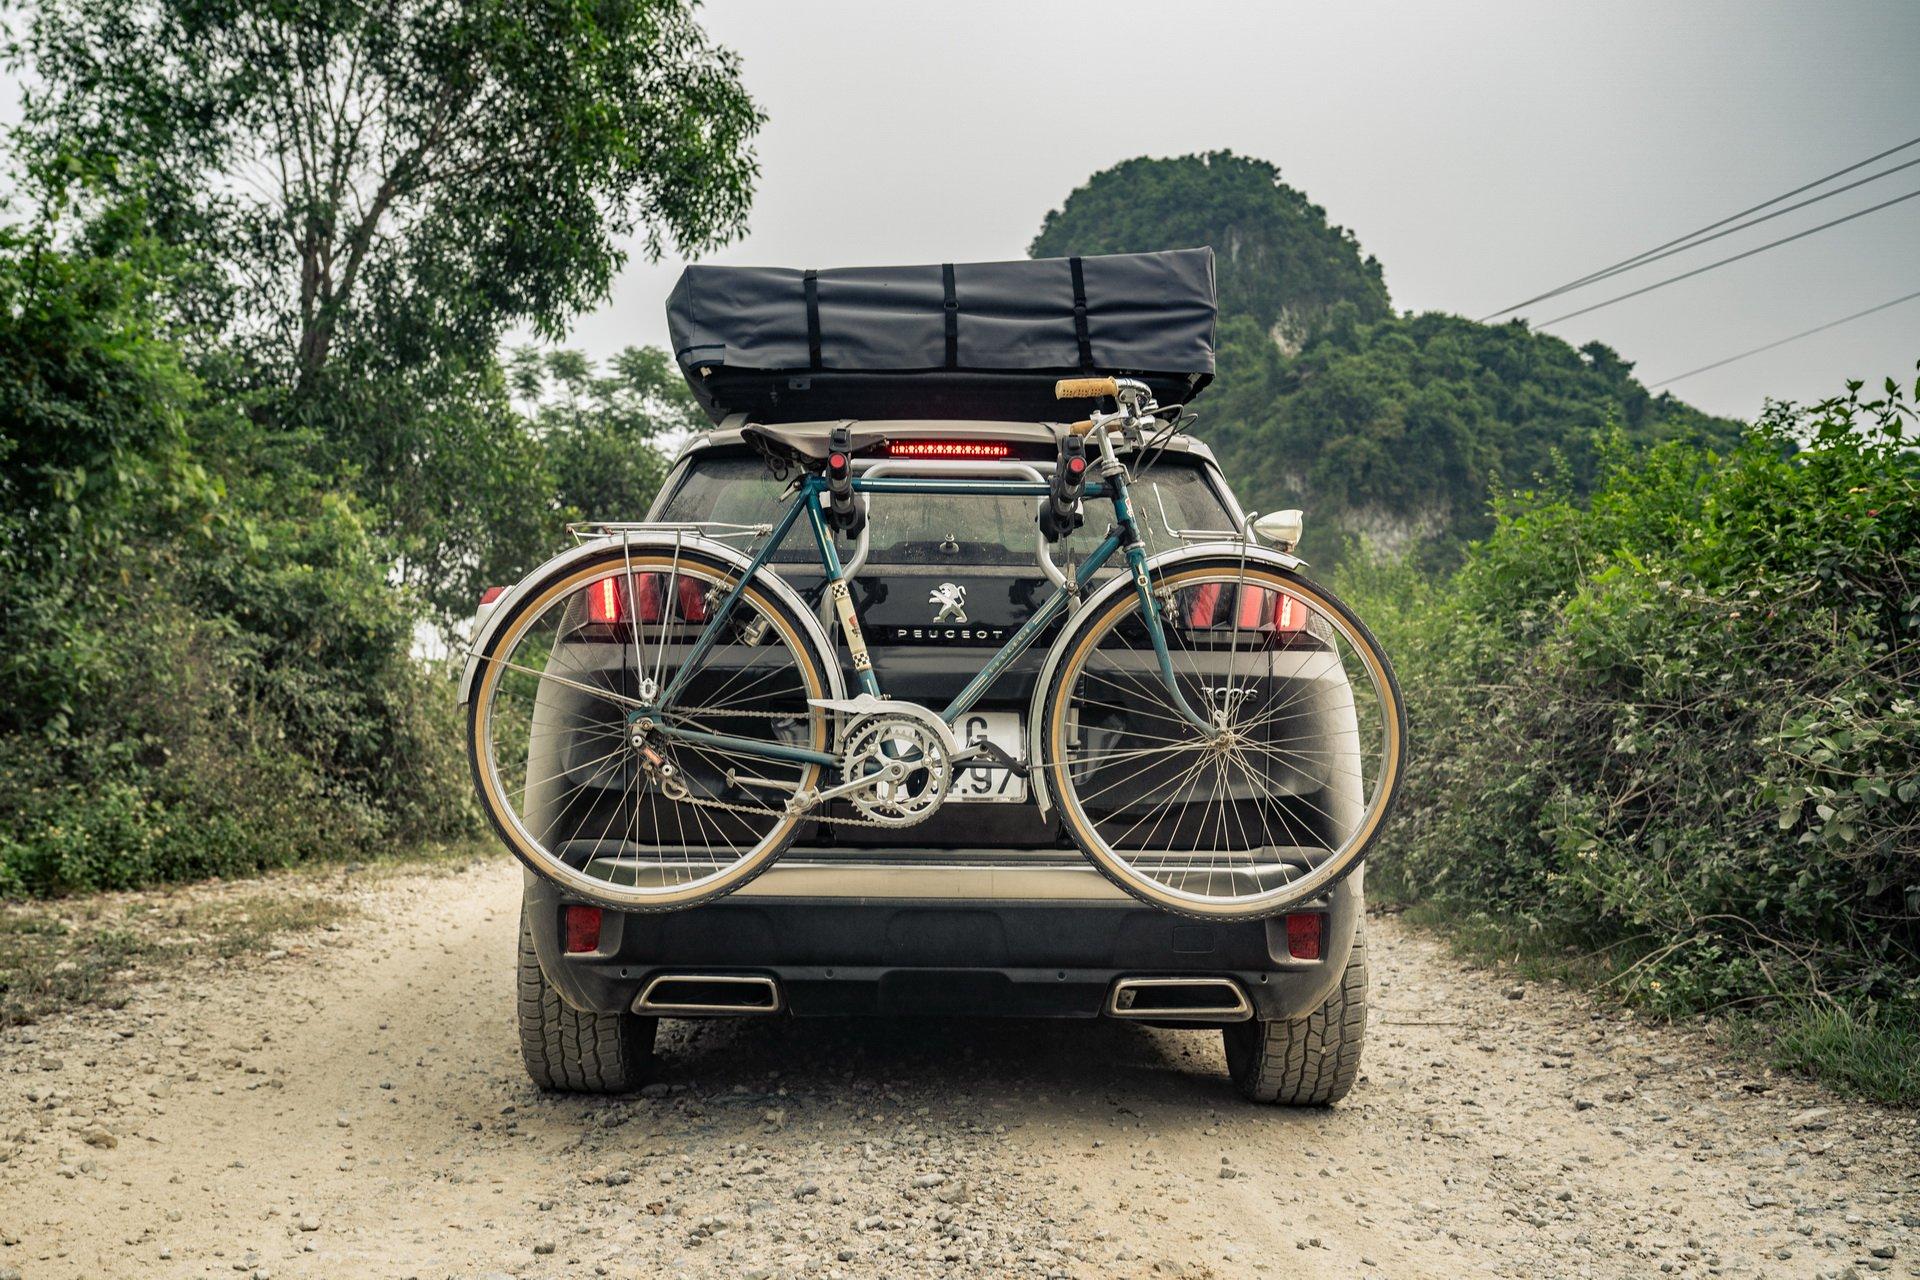 Peugeot-3008-Concept-Vietnam-Adventure-5